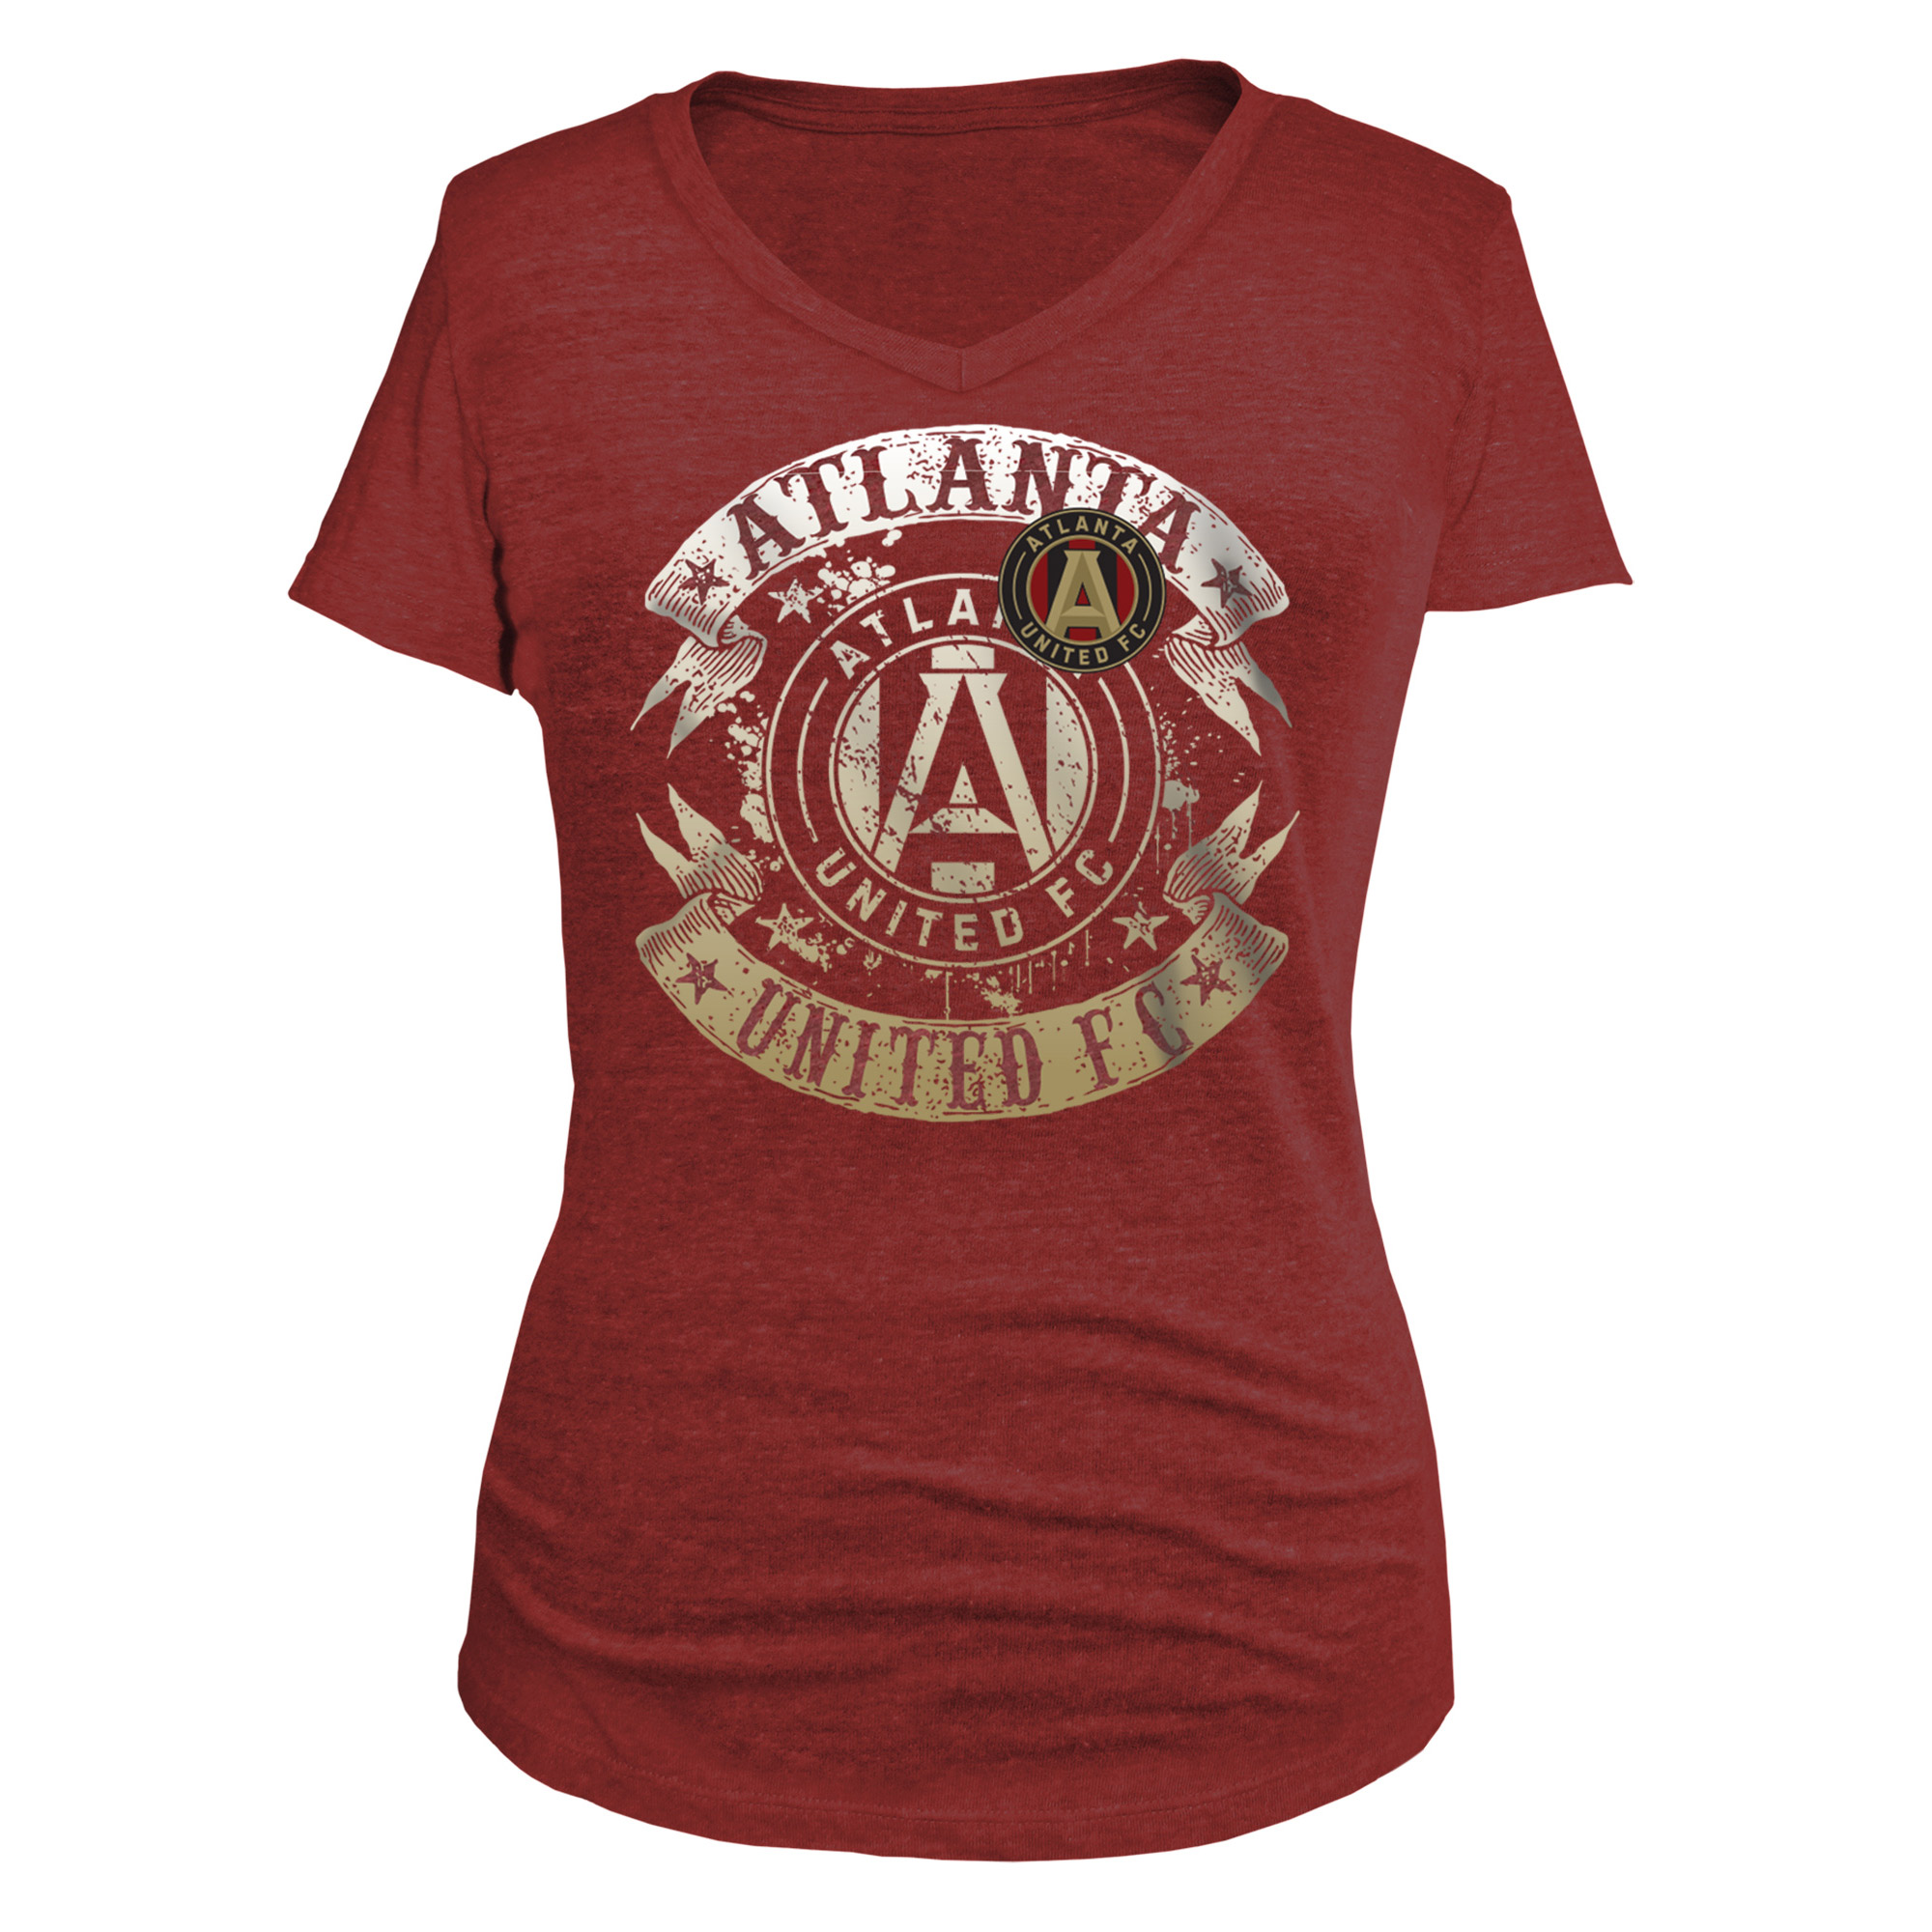 Atlanta United FC 5th & Ocean by New Era Women's Tri-Blend V-Neck T-Shirt - Red